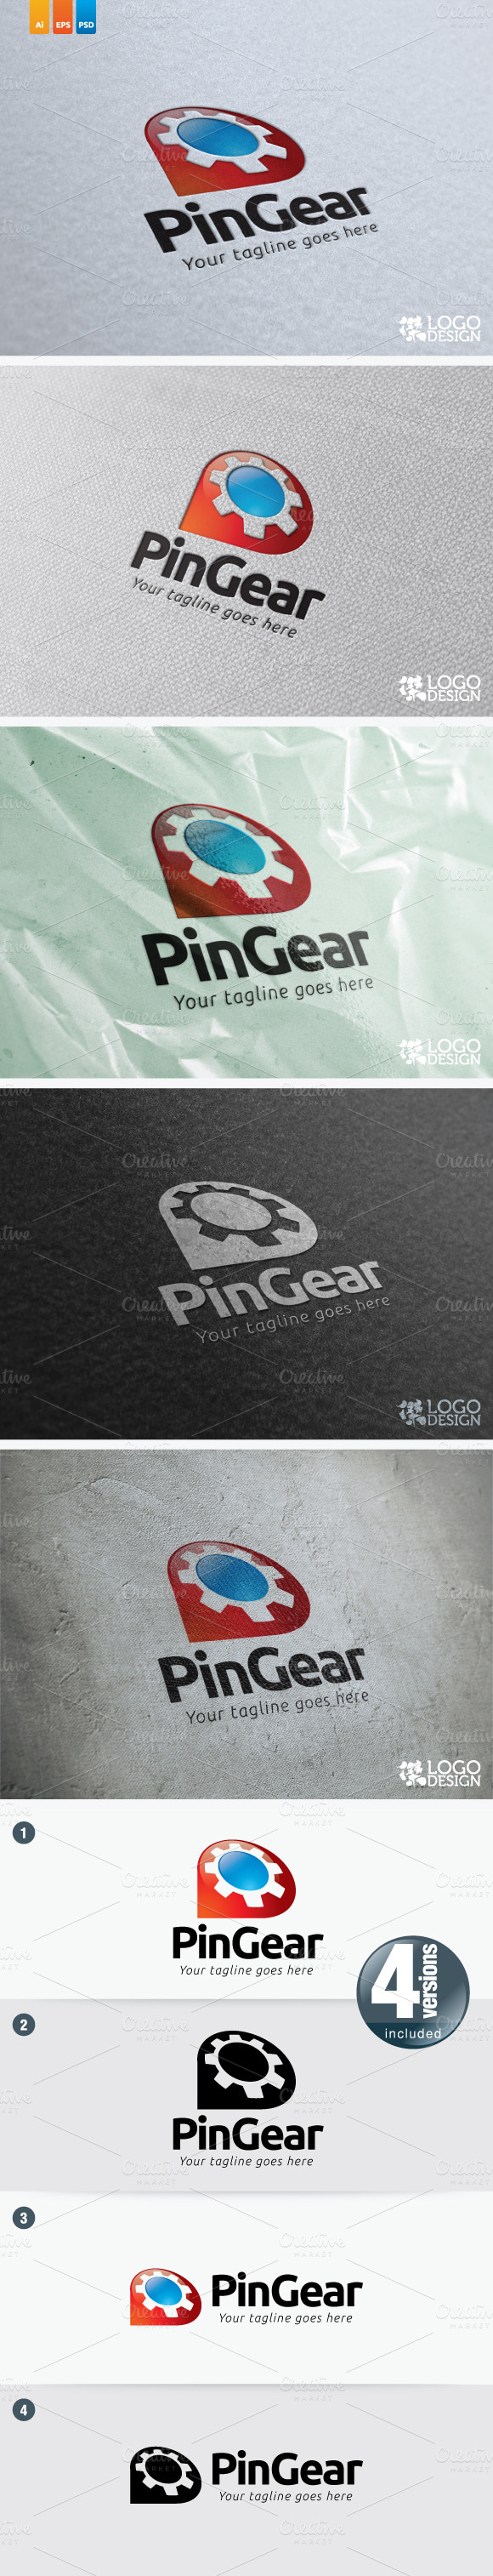 Pin Gear